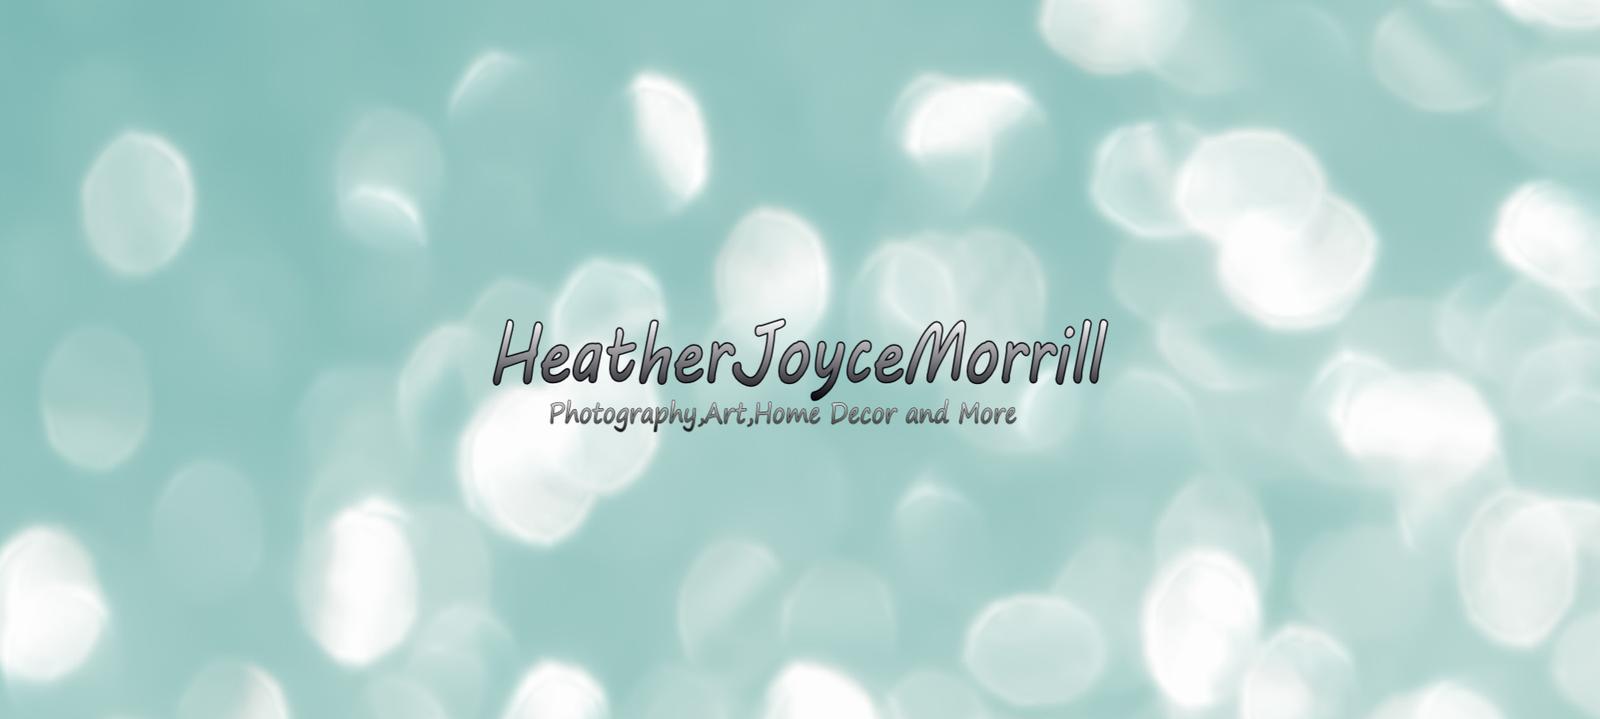 HeatherJoyceMorrill